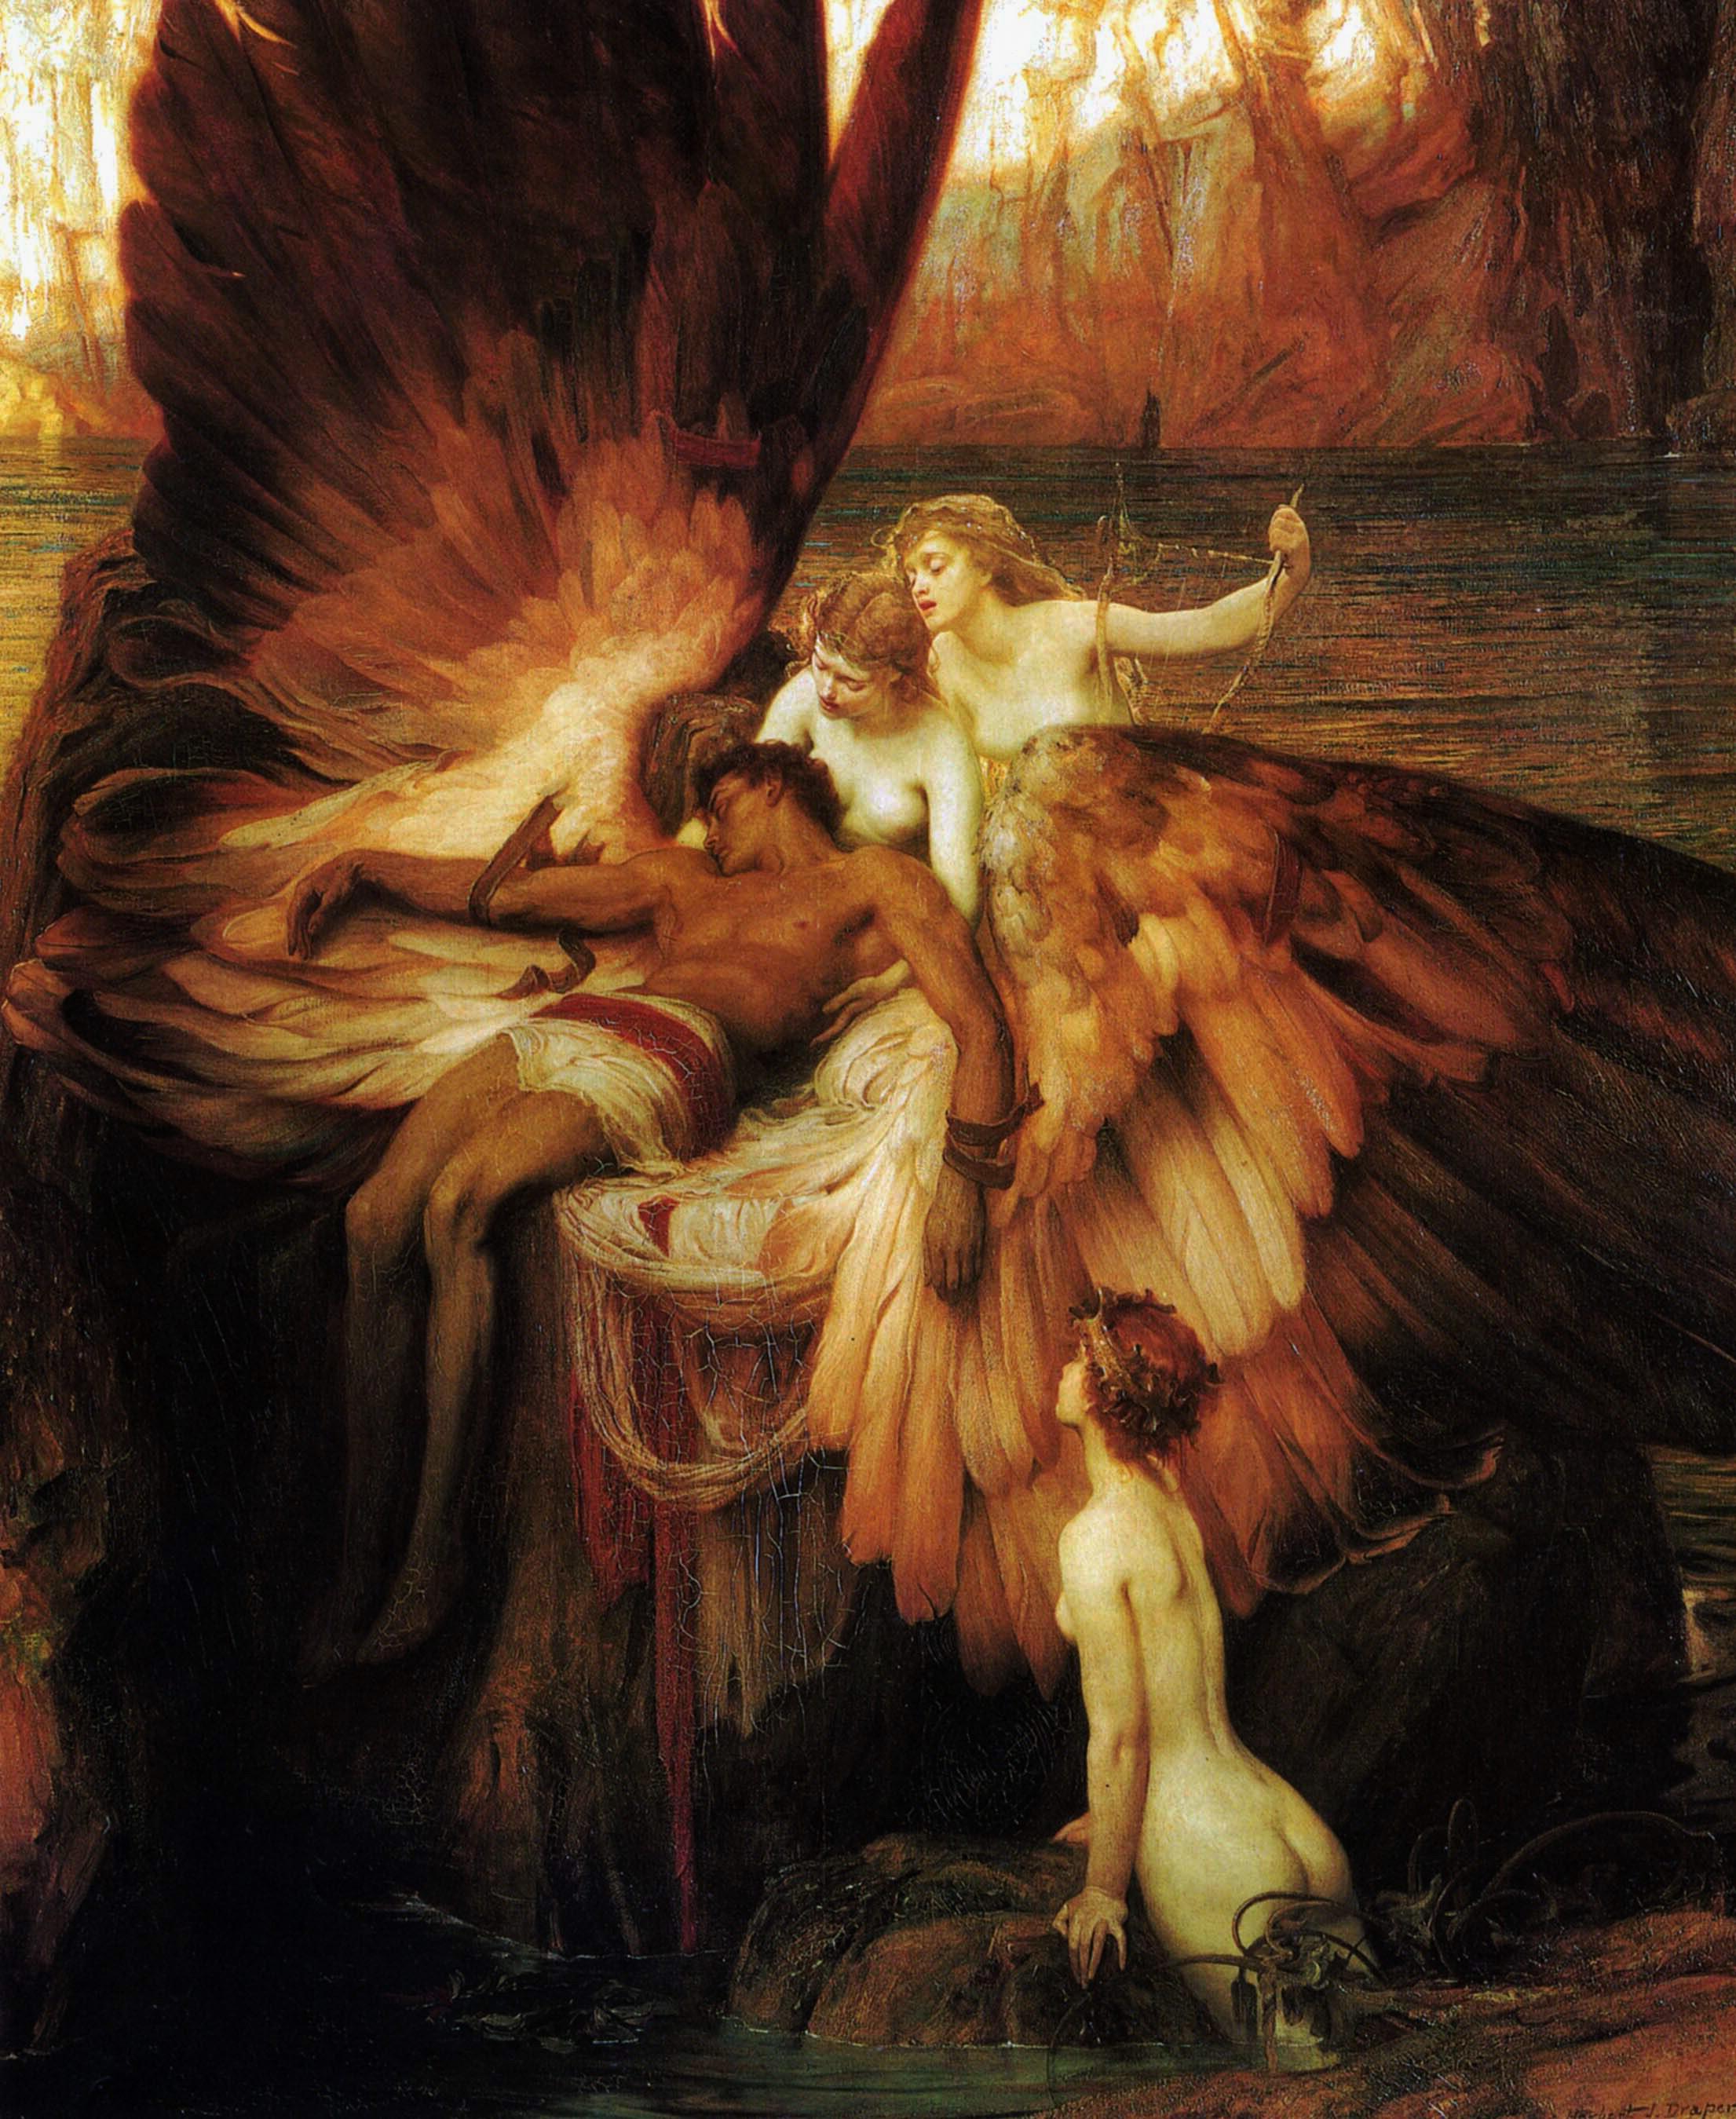 """Pagluluksa kay Icarus"" ni Henry James Draper"